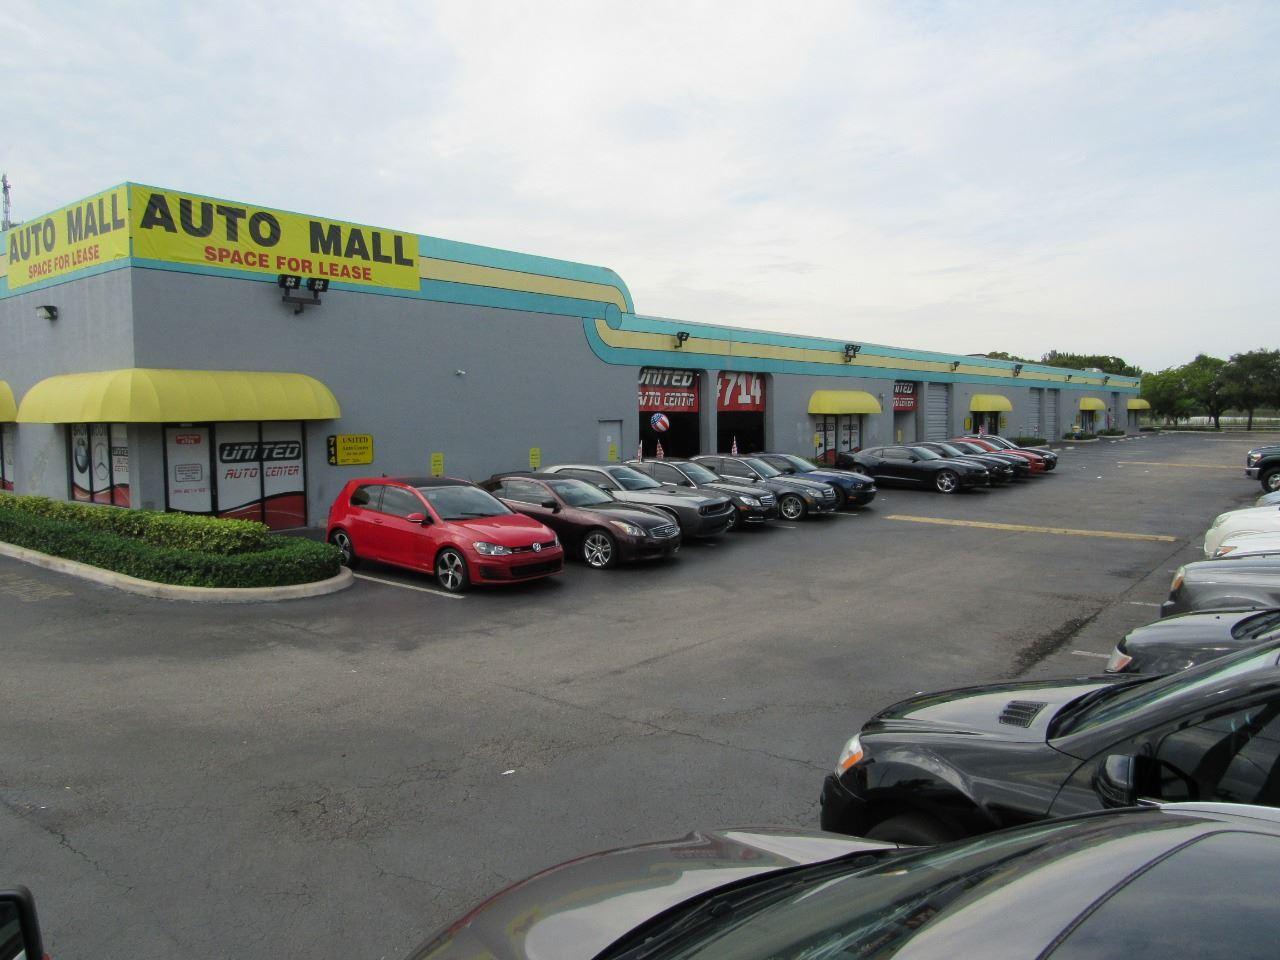 United Auto Center